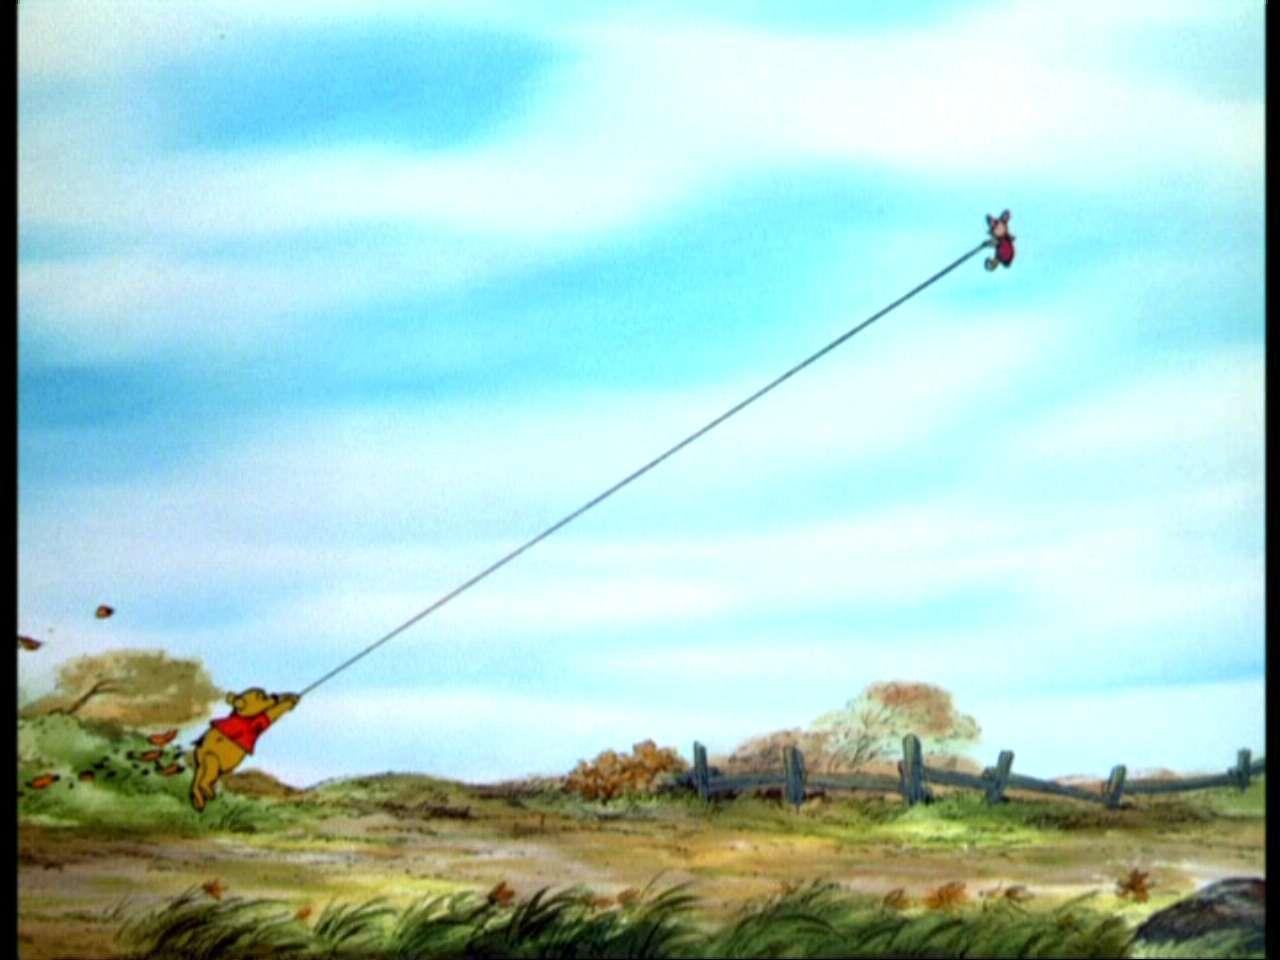 Winnie the Pooh and the Blustery siku